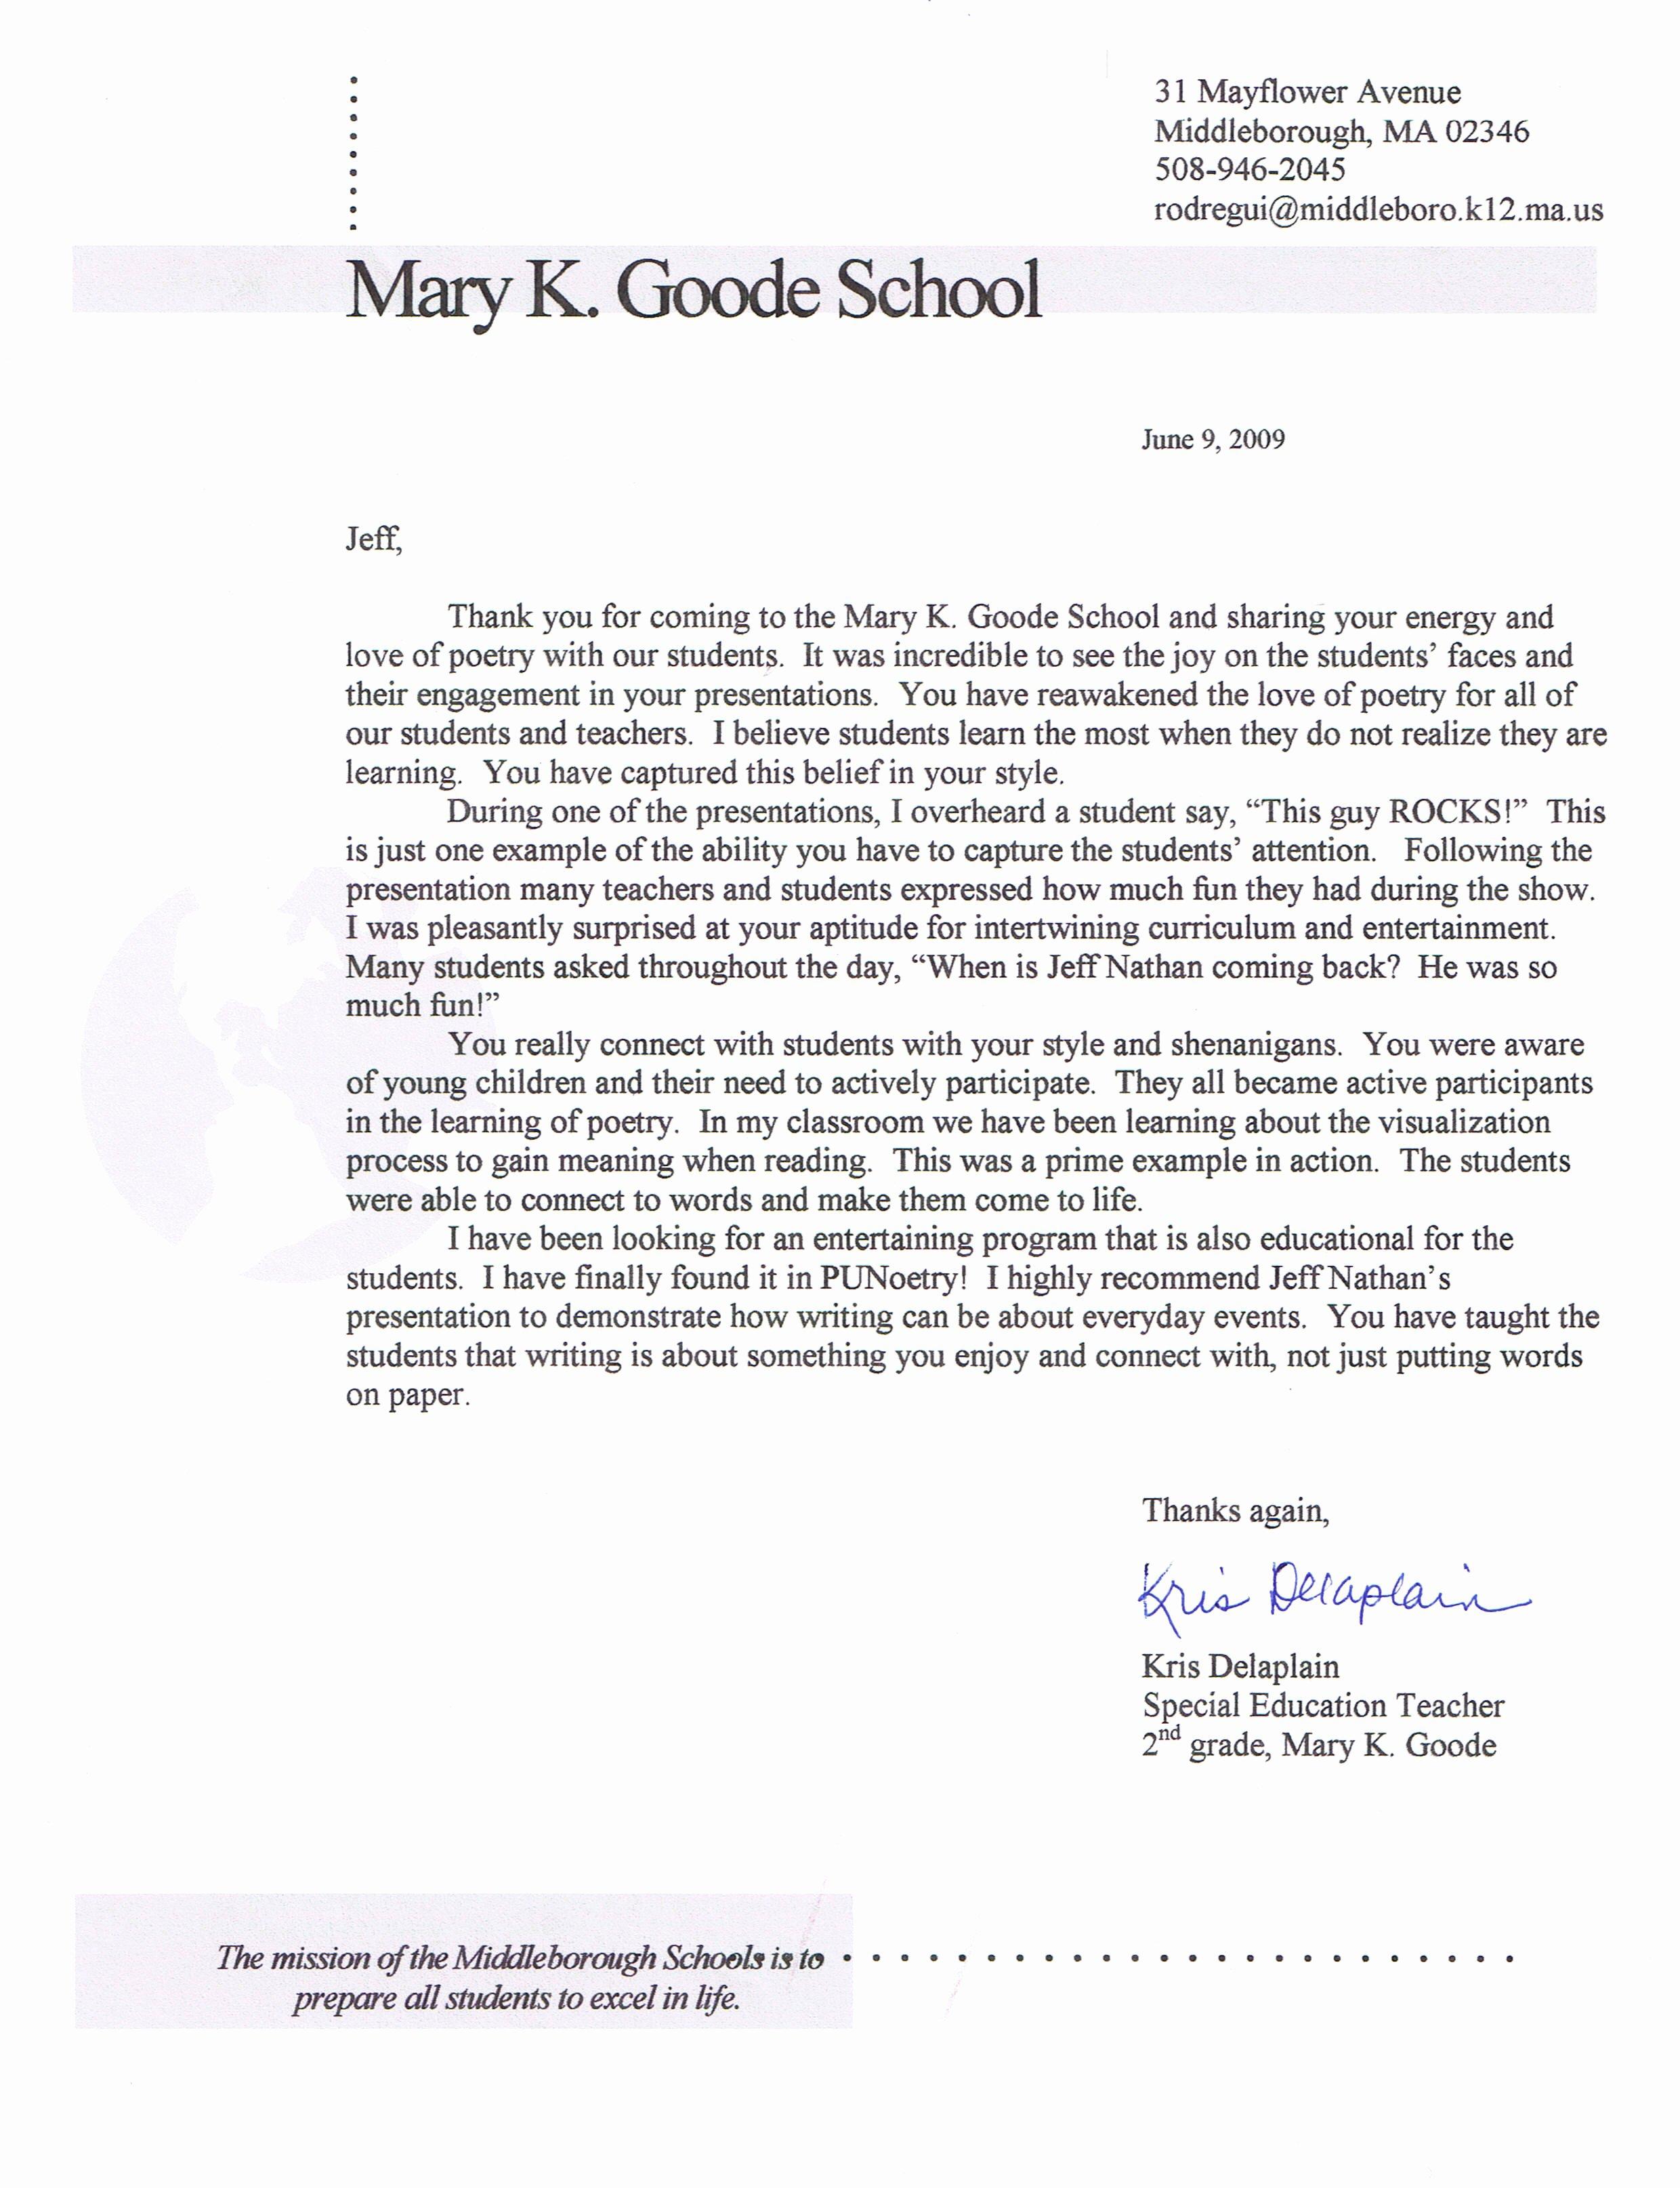 Student Recommendation Letter From Teacher Elegant Student Re Mendation Letter From Teacher